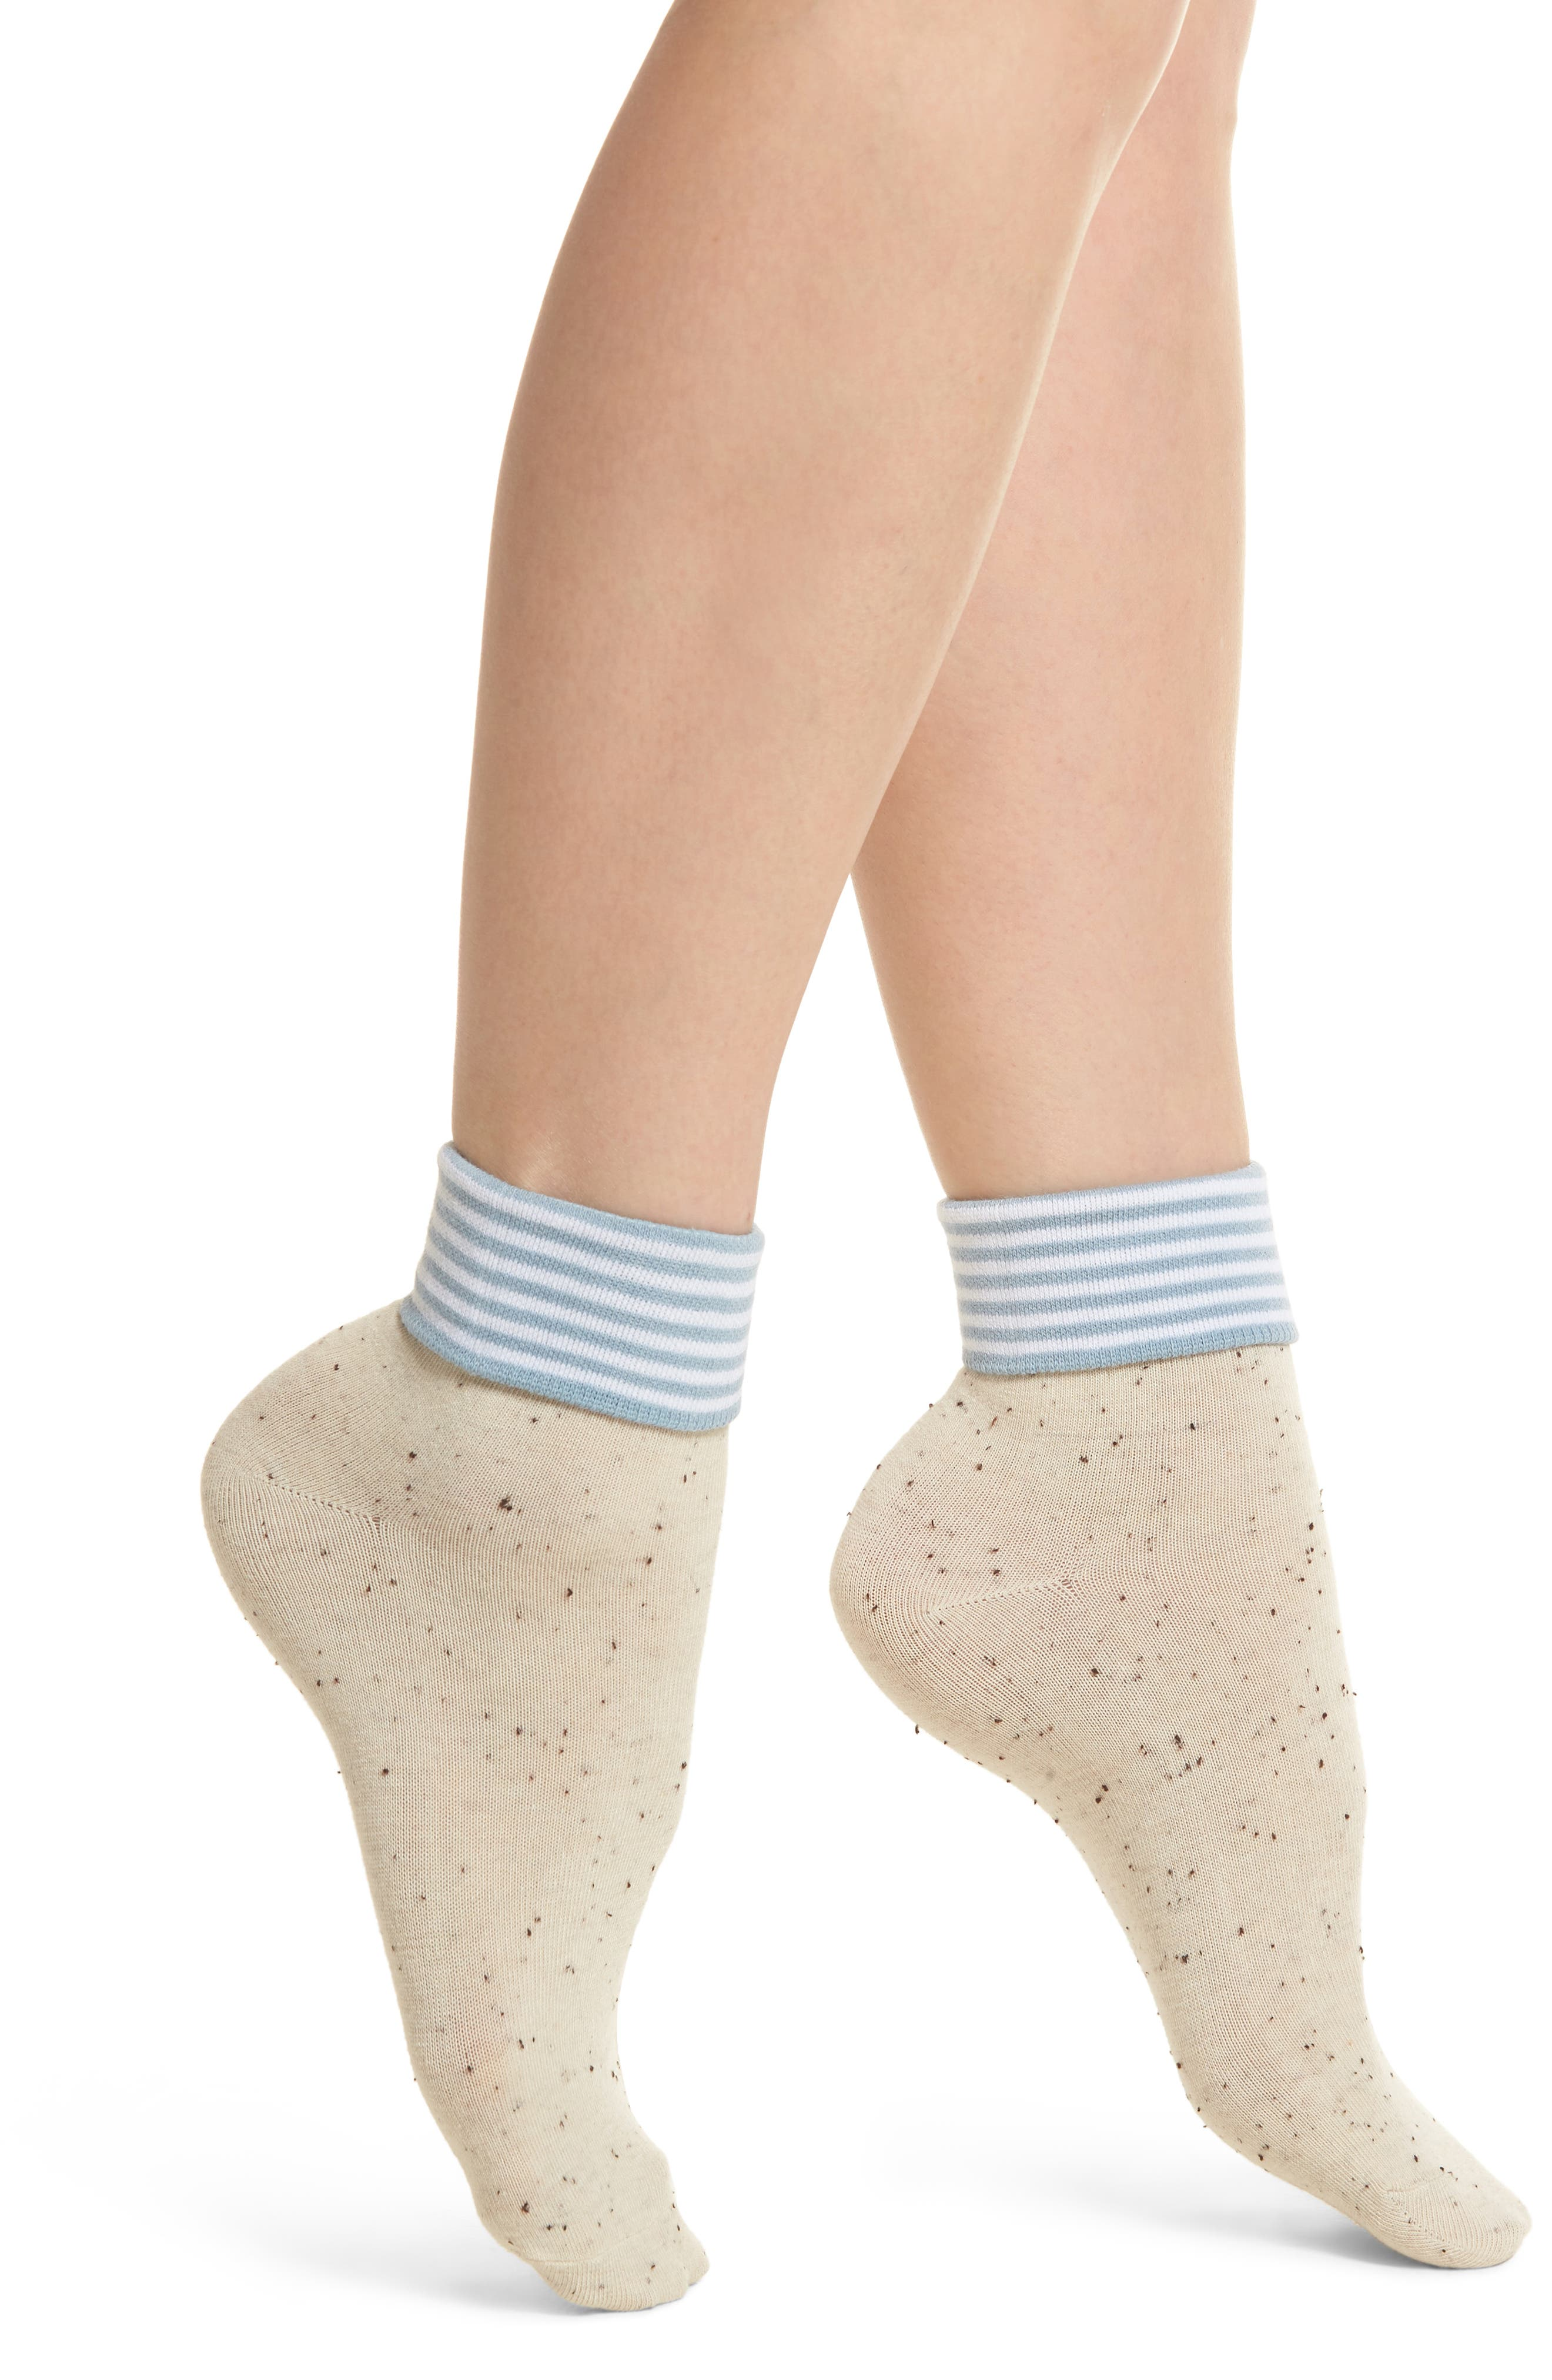 Tina Foldover Ankle Socks,                             Main thumbnail 1, color,                             Oatmeal